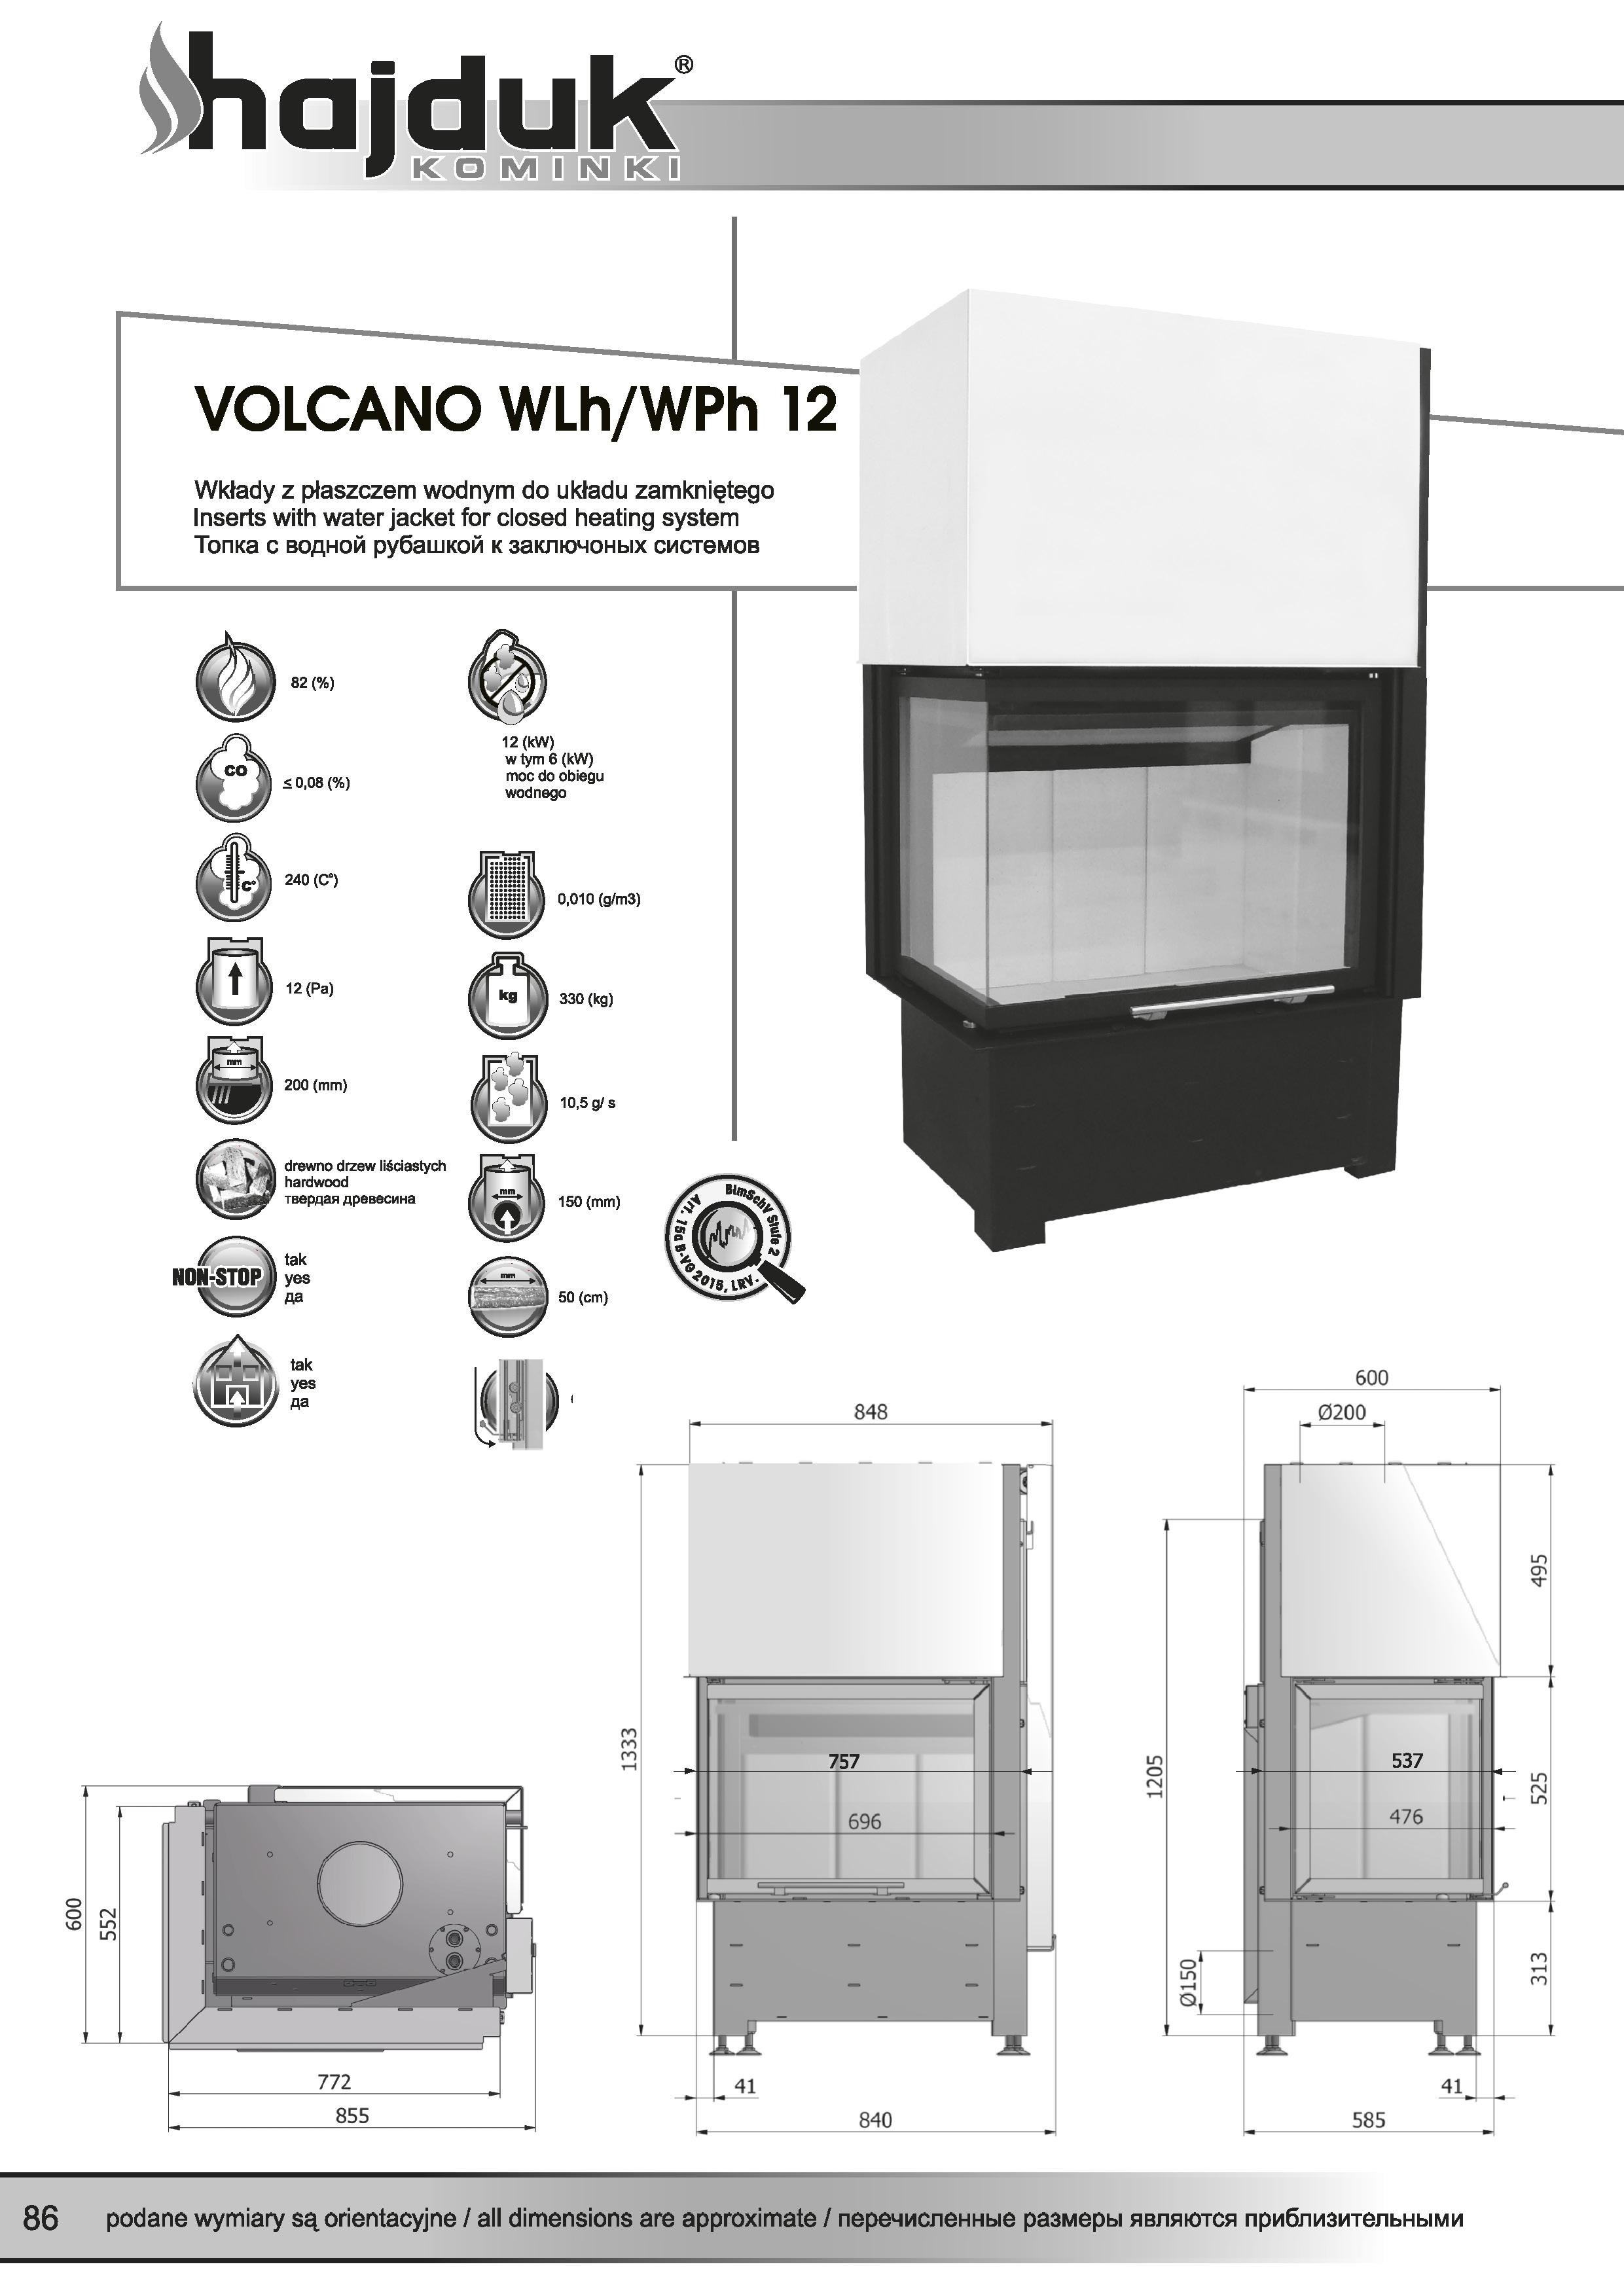 Volcano%20WLh%20WPh%20 %2012%20 %20karta%20techniczna - Kamineinsatz Hajduk Volcano WLh-12